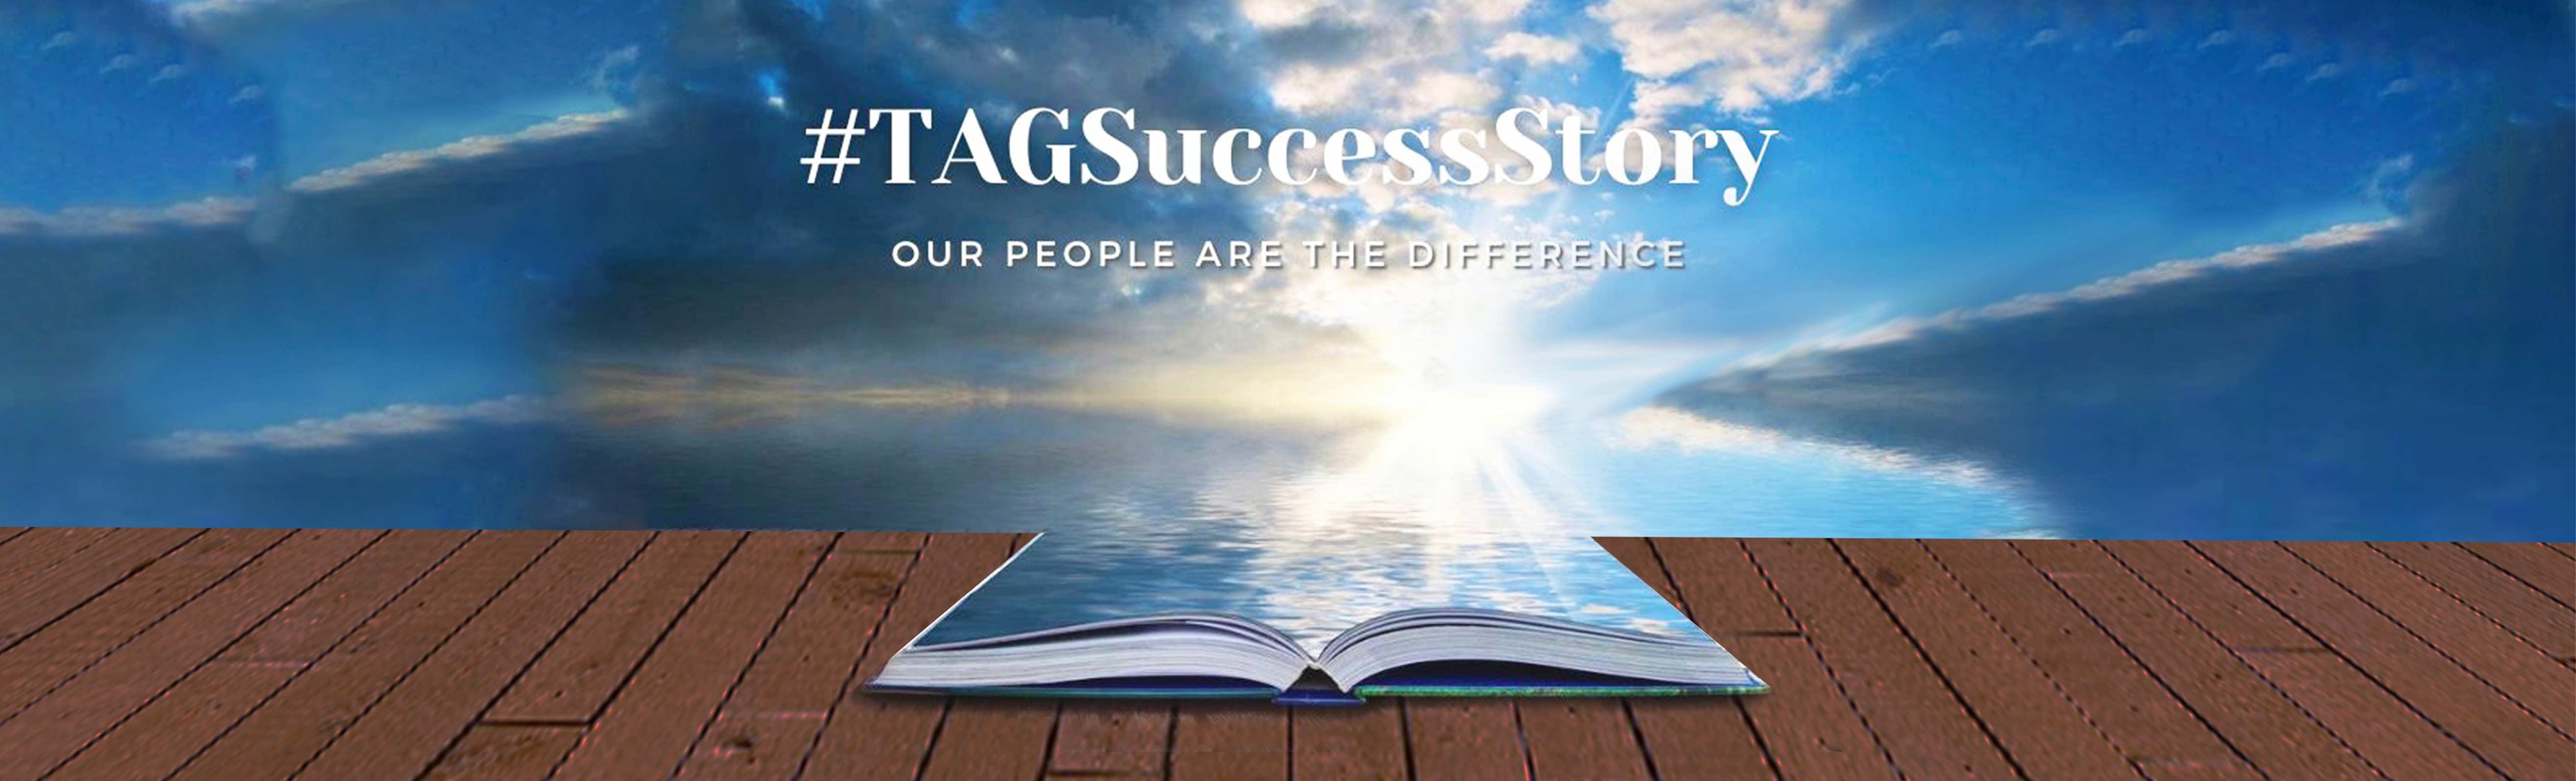 #TAG成功故事:水手回归—第一章